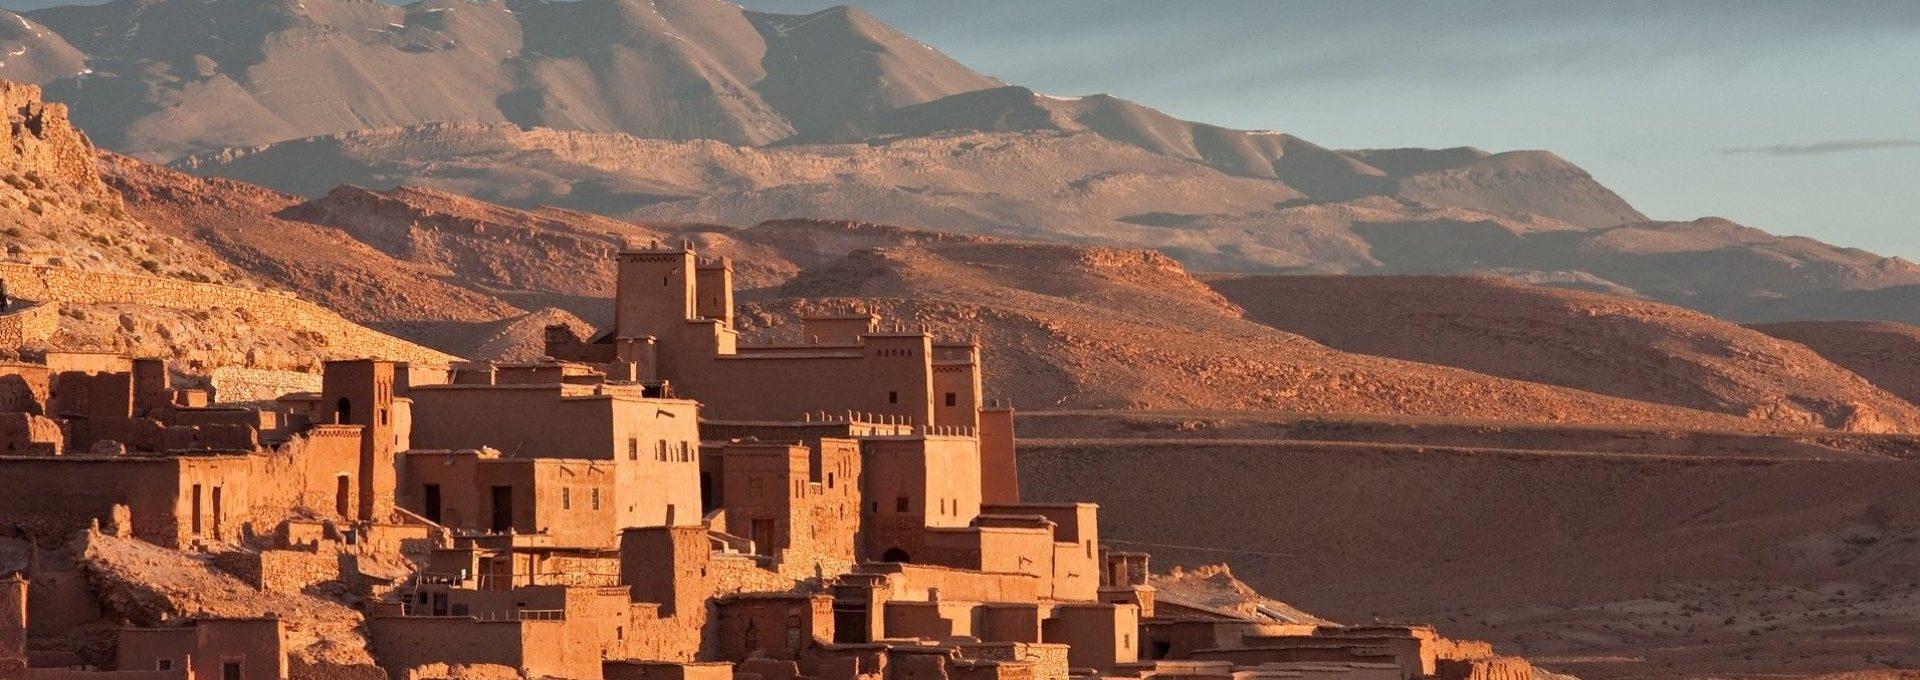 Roaming Camels Morocco